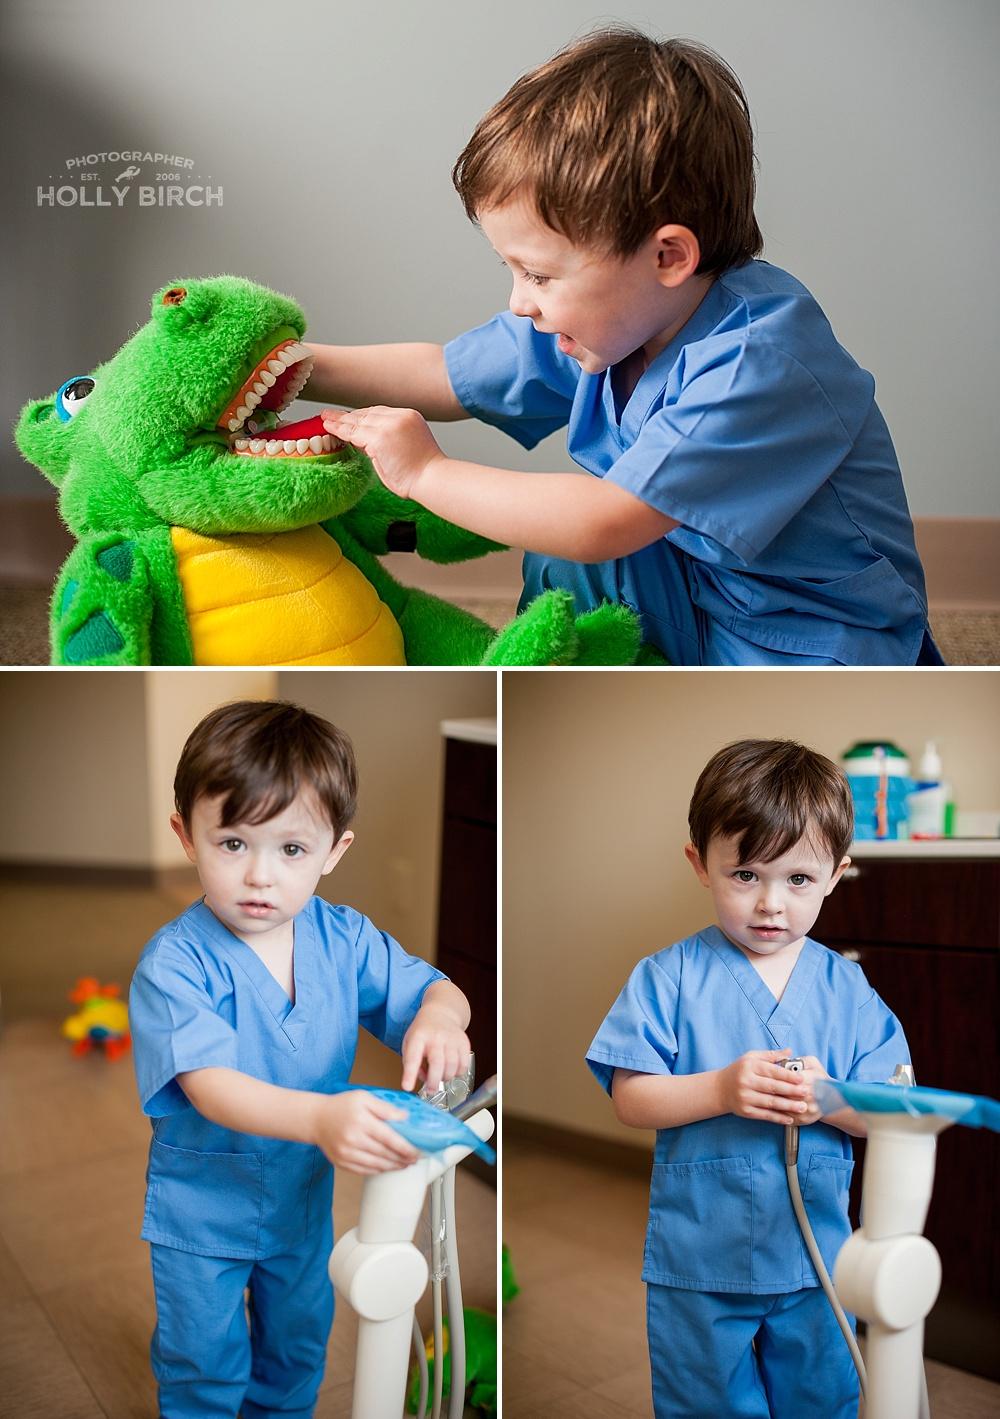 dentist themed kids photo shoot